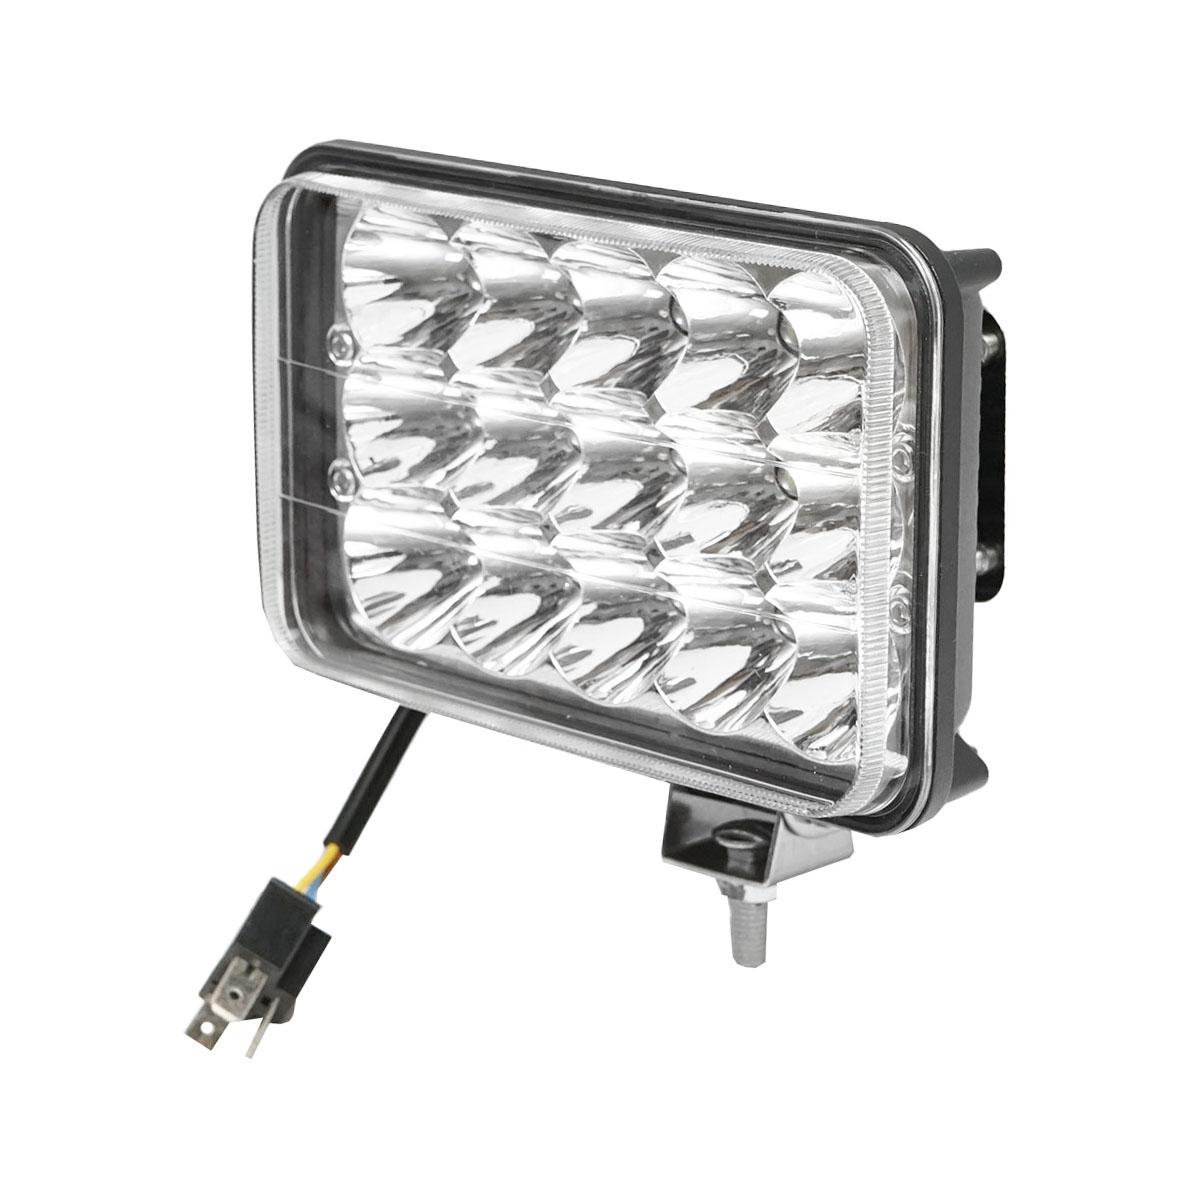 Lampa iluminat 15 leduri 10-30V 45W - unghi radiere 30 de grade tip spot